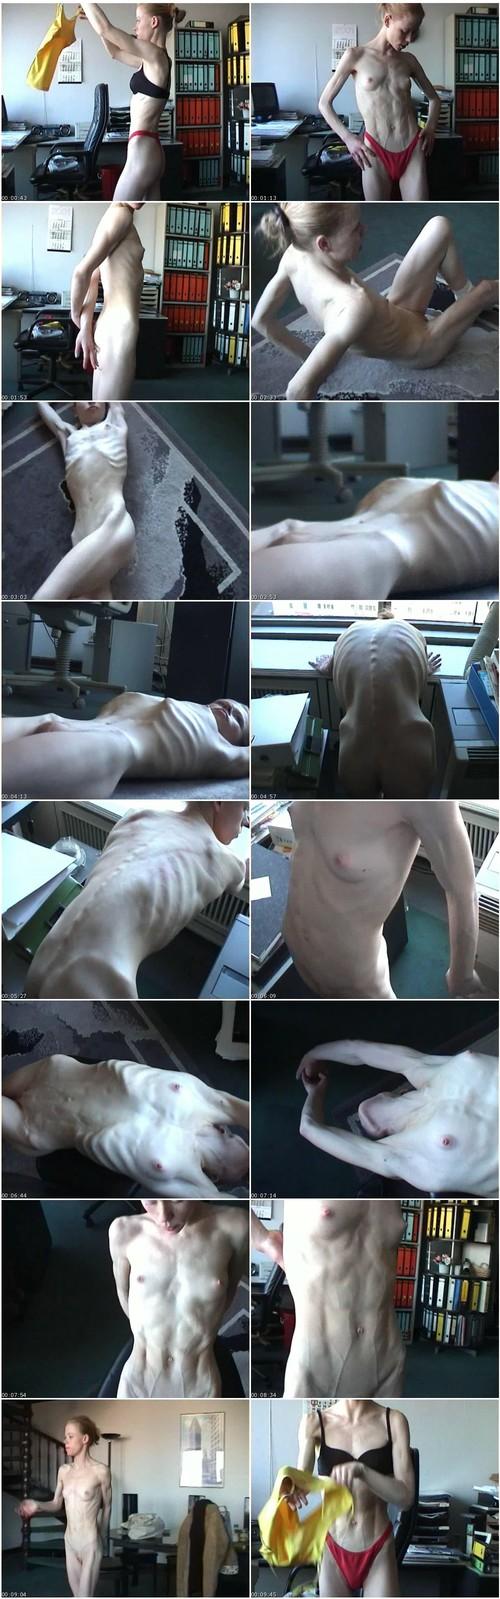 https://ist5-1.filesor.com/pimpandhost.com/9/6/8/3/96838/6/J/1/k/6J1kN/Anorexia-y037_thumb_m.jpg